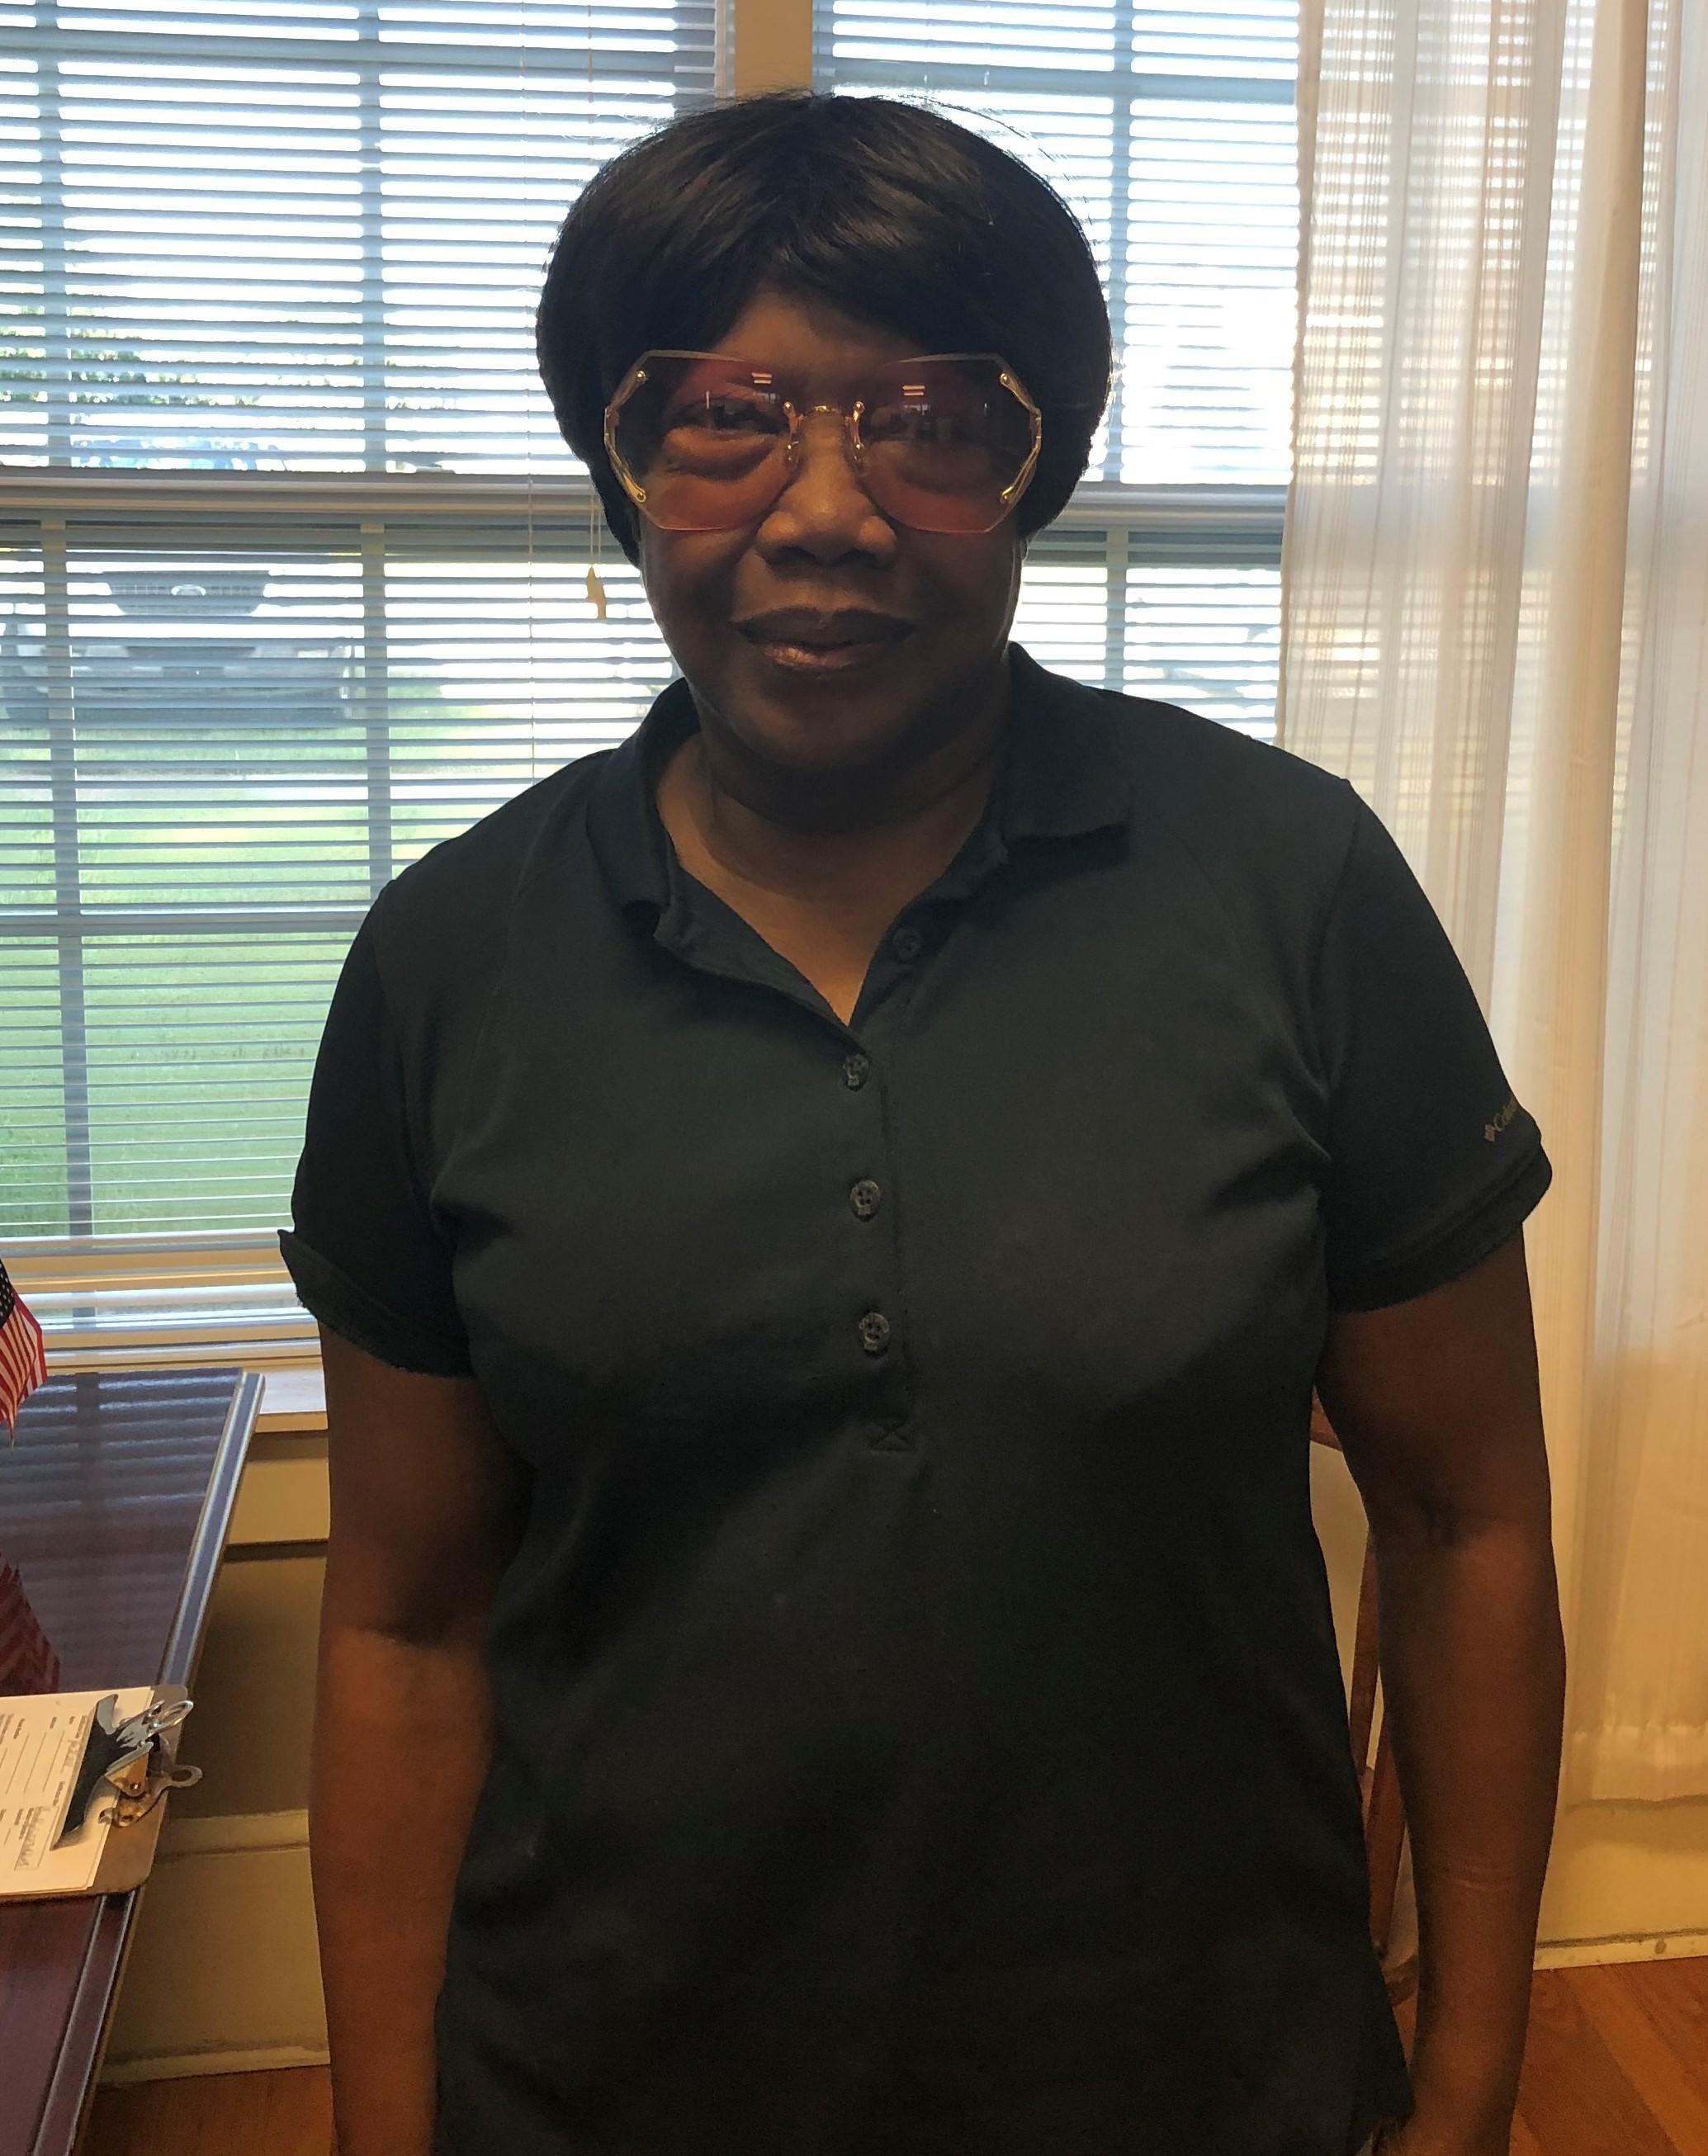 Mrs. Rose Smith / Nursery Worker